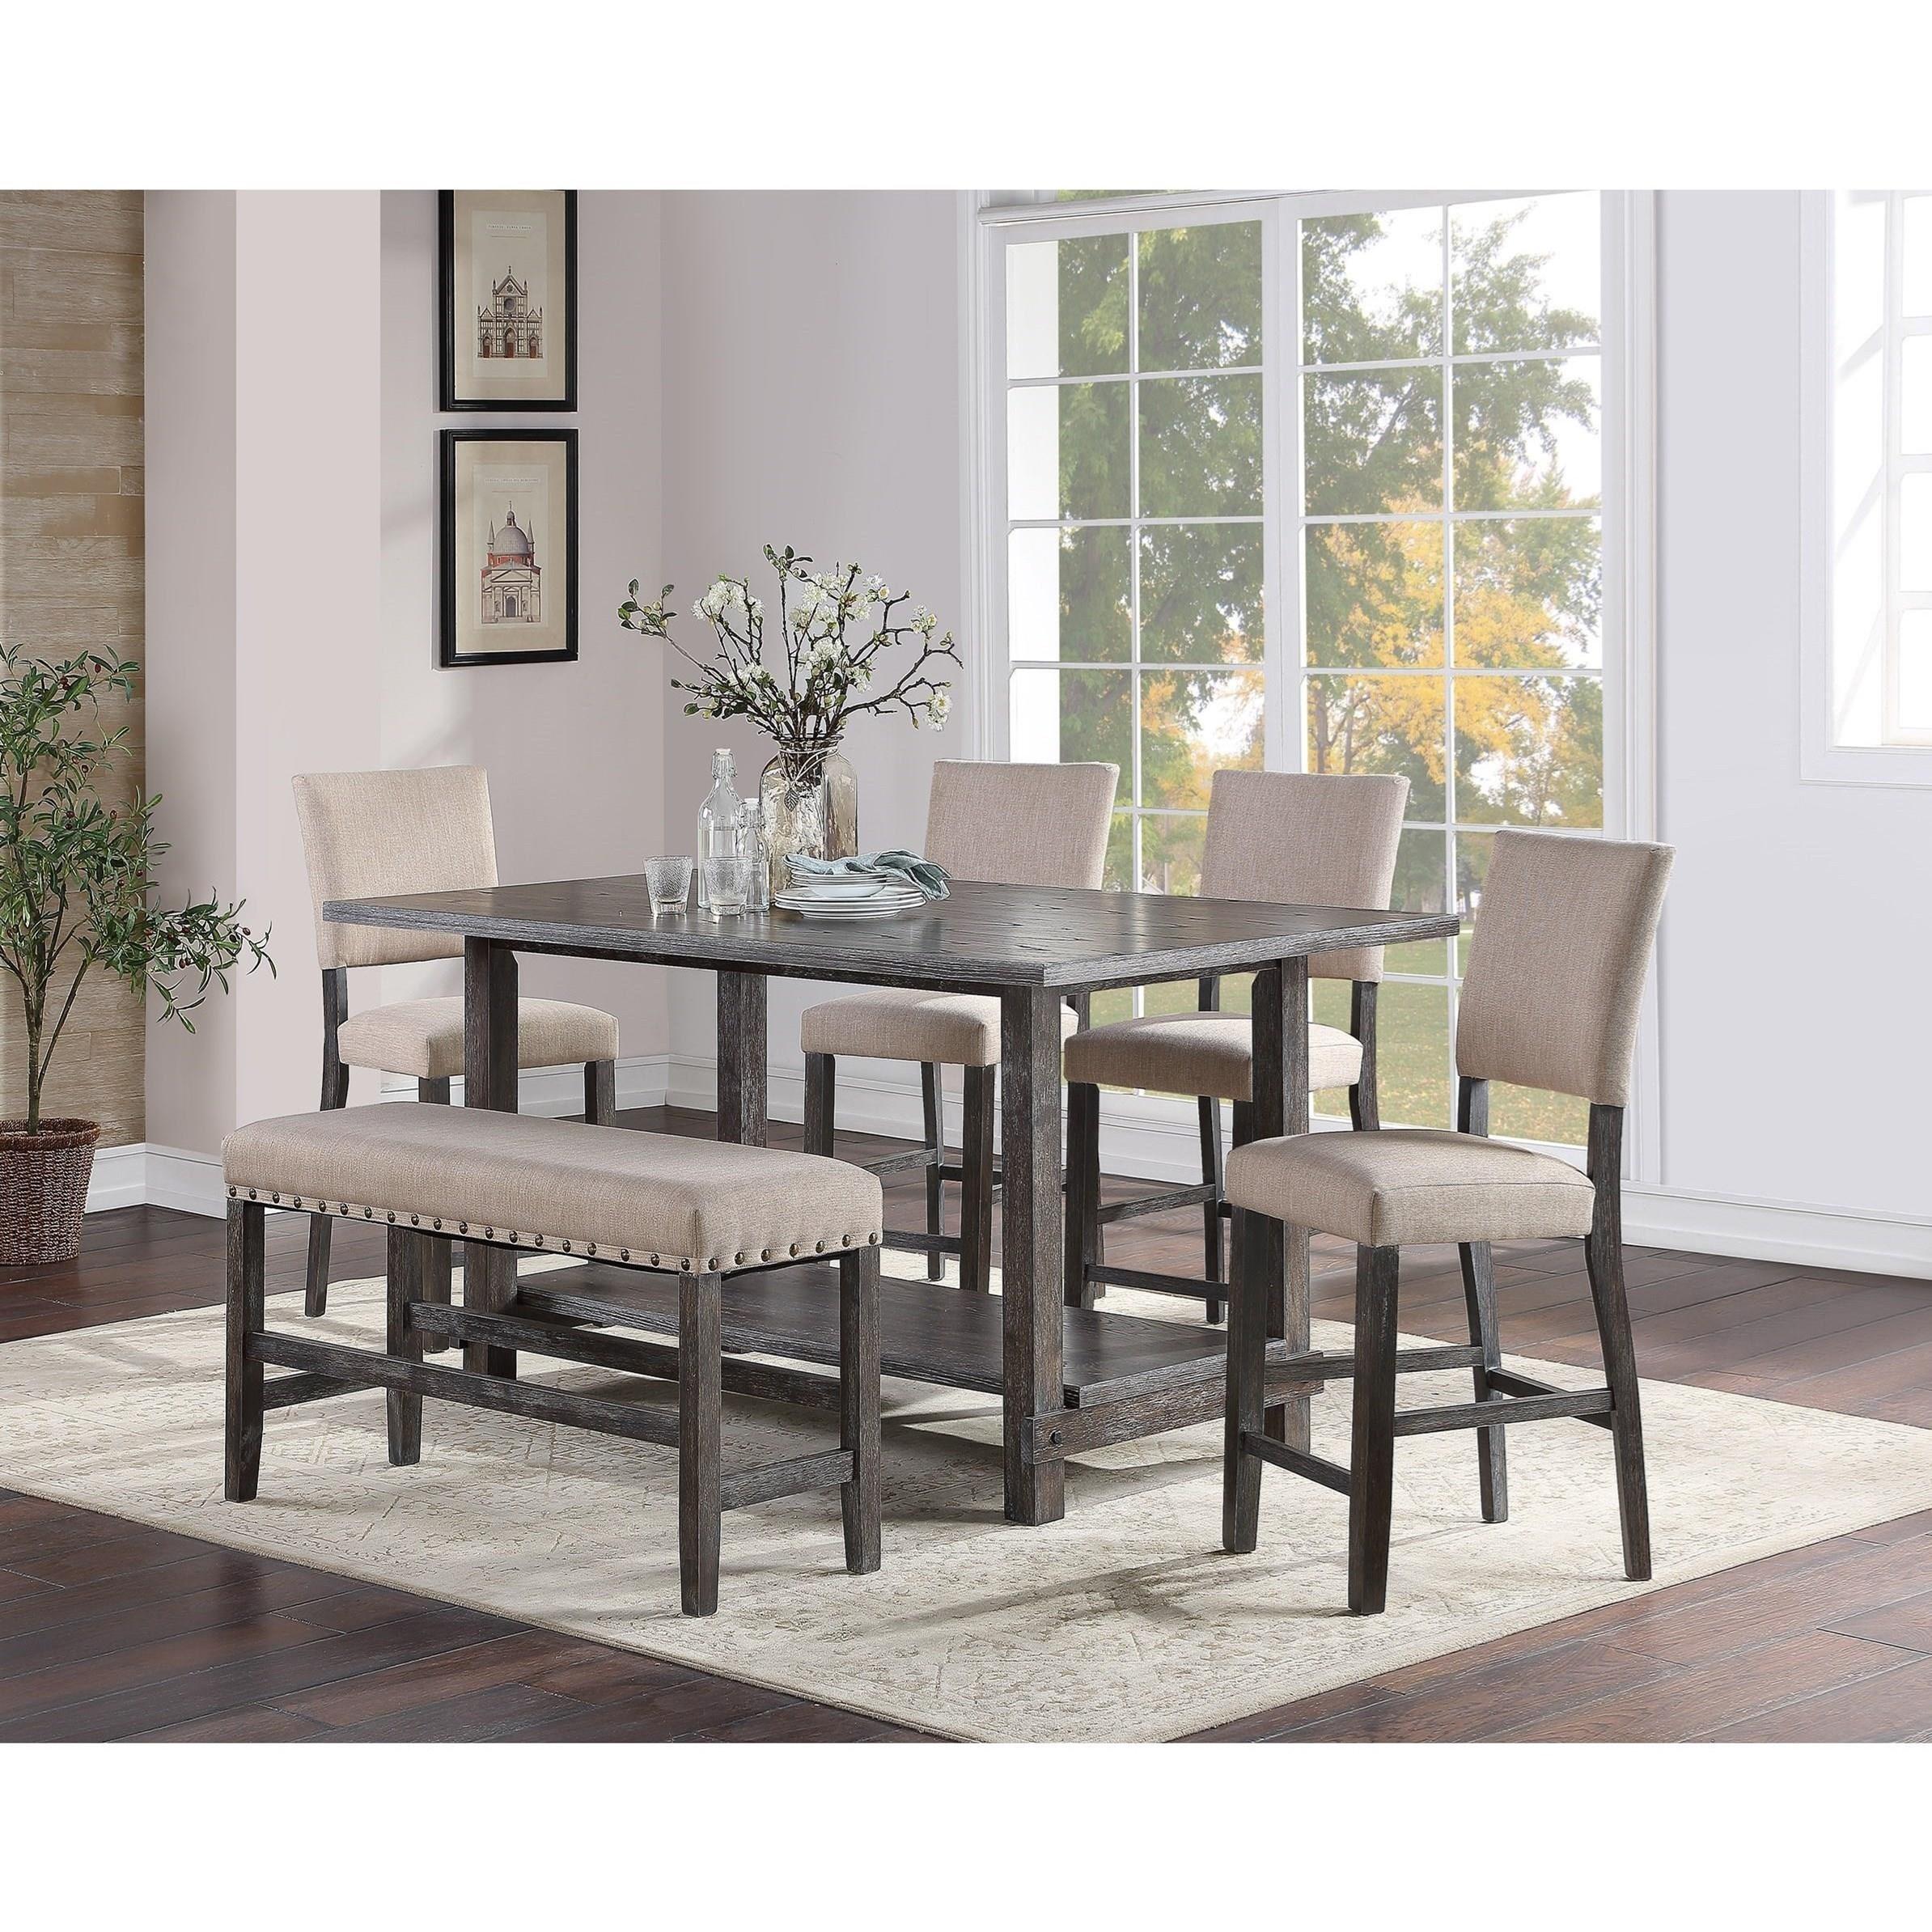 Standard Furniture Aubrun Charcoal Rustic Counter Height ...